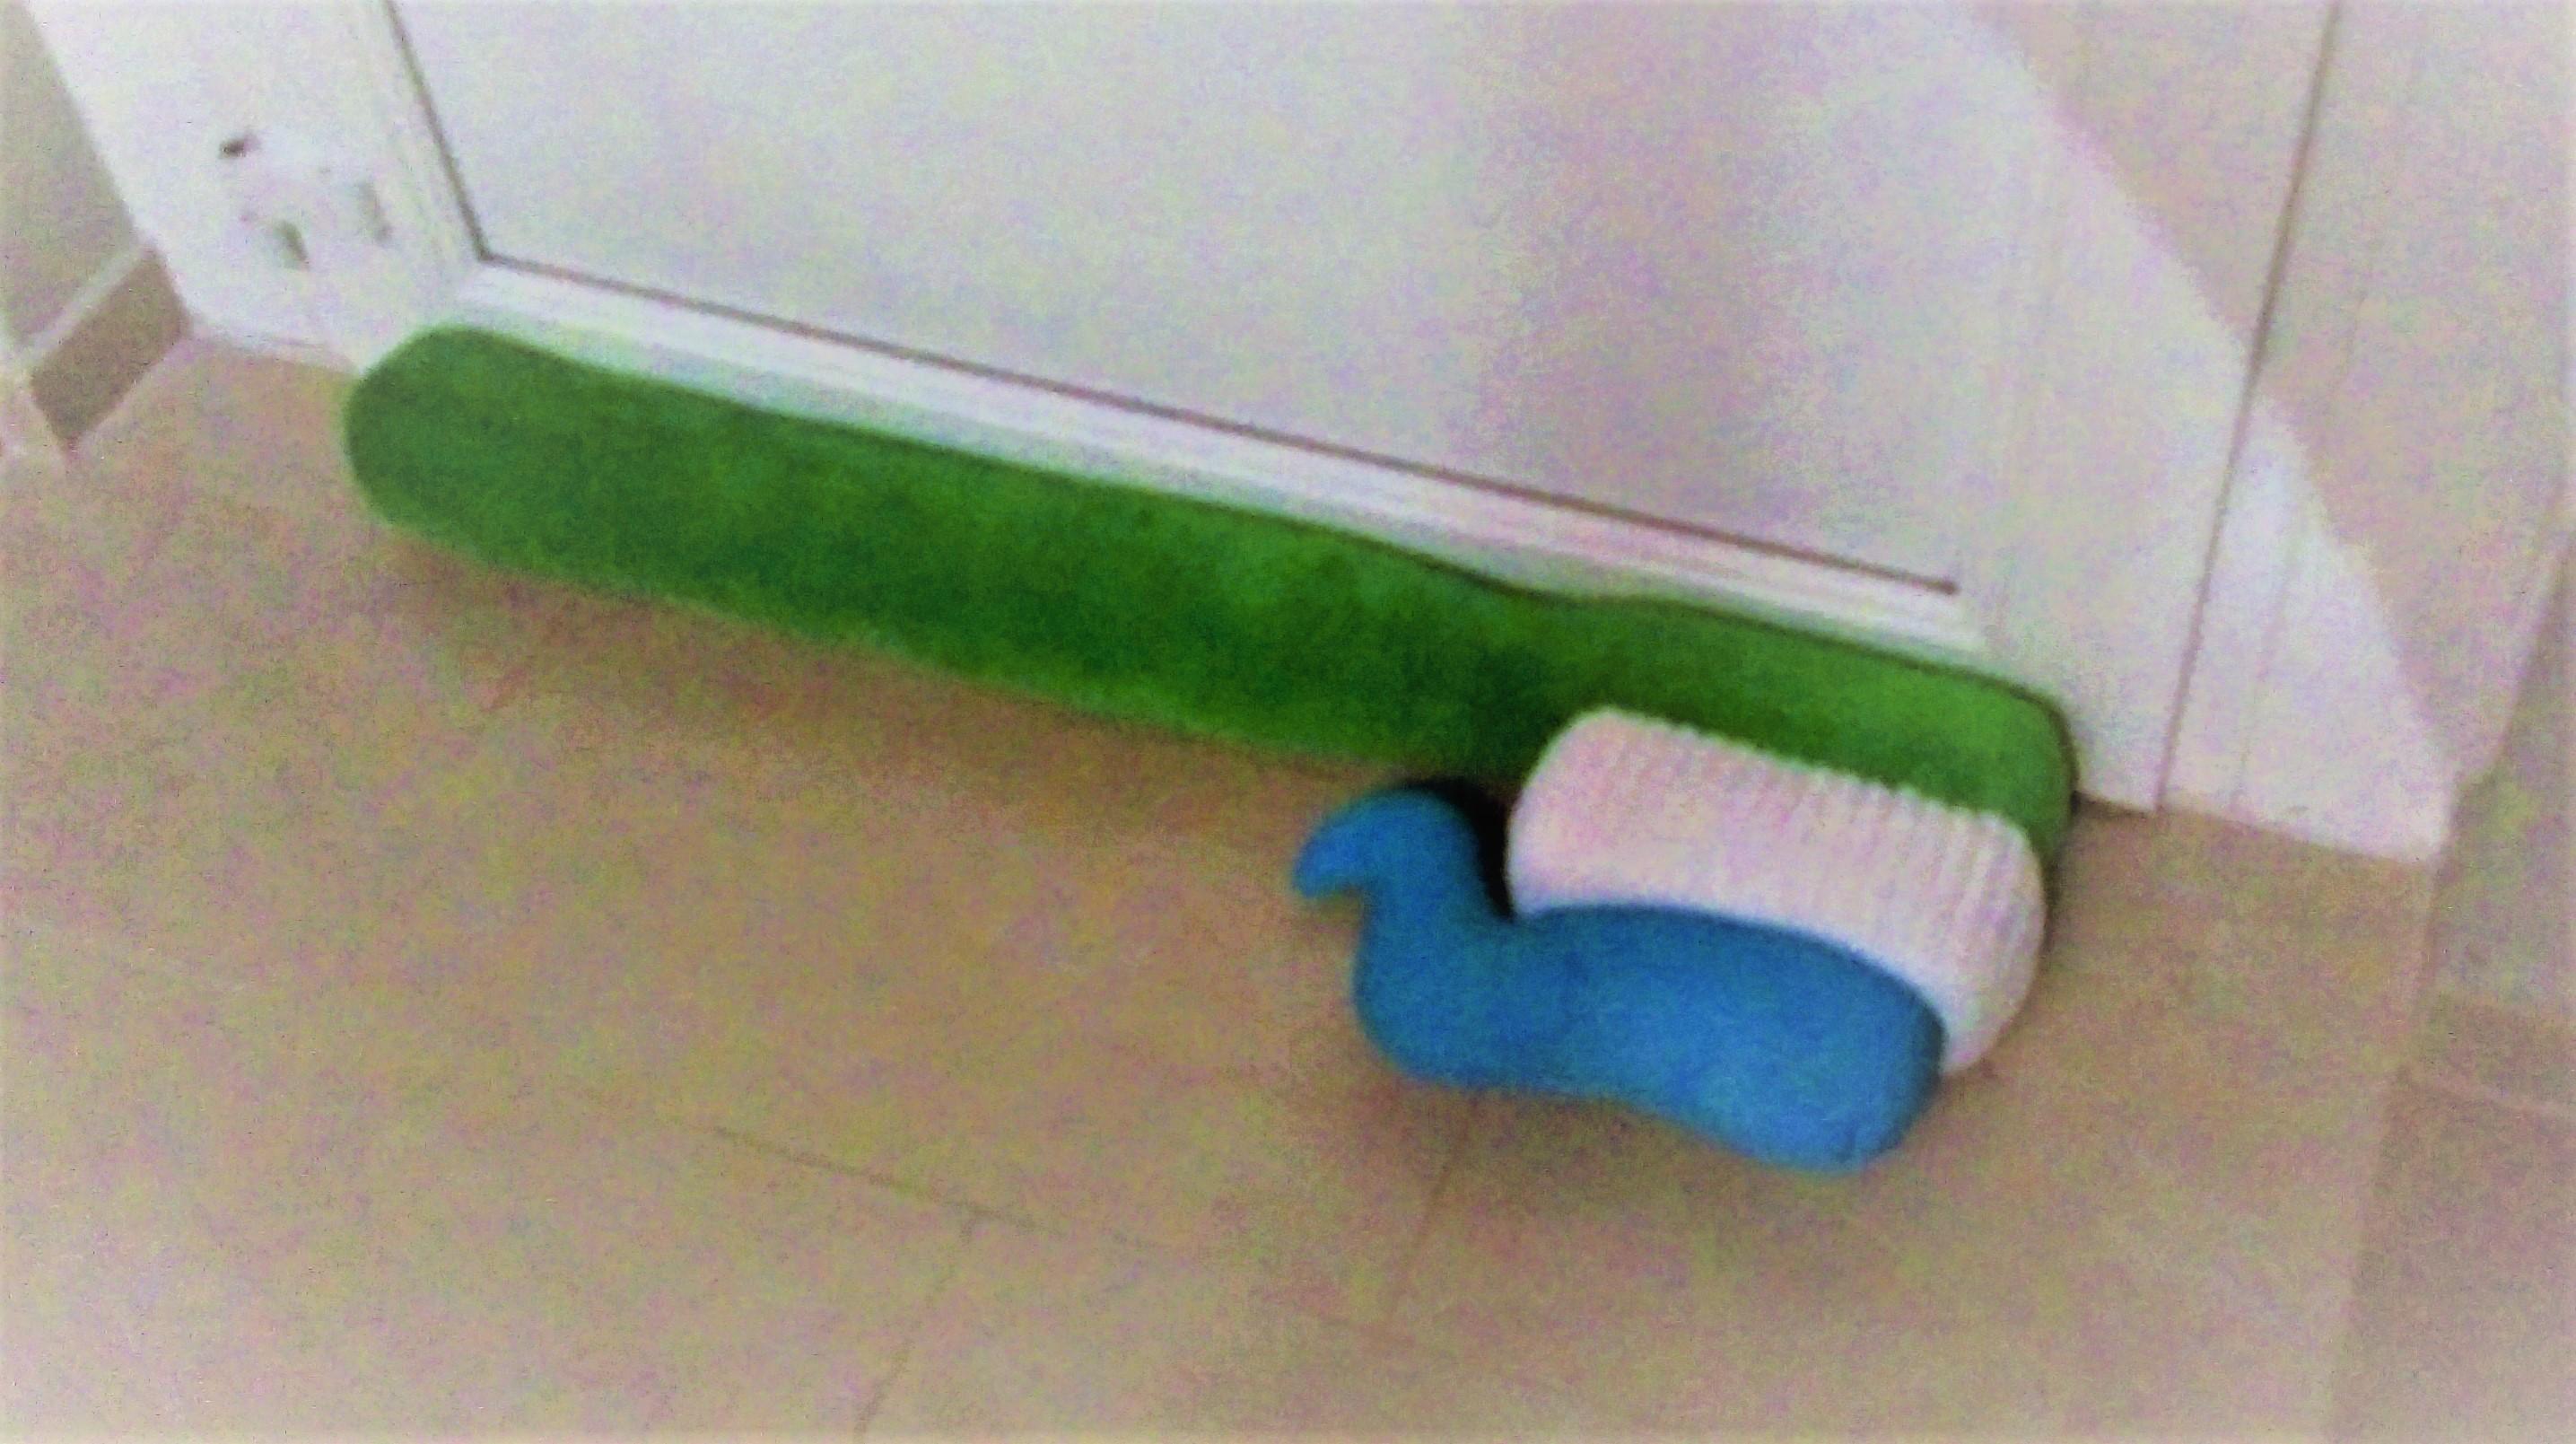 ikea tandenborstel blauw groen tandpasta interieur